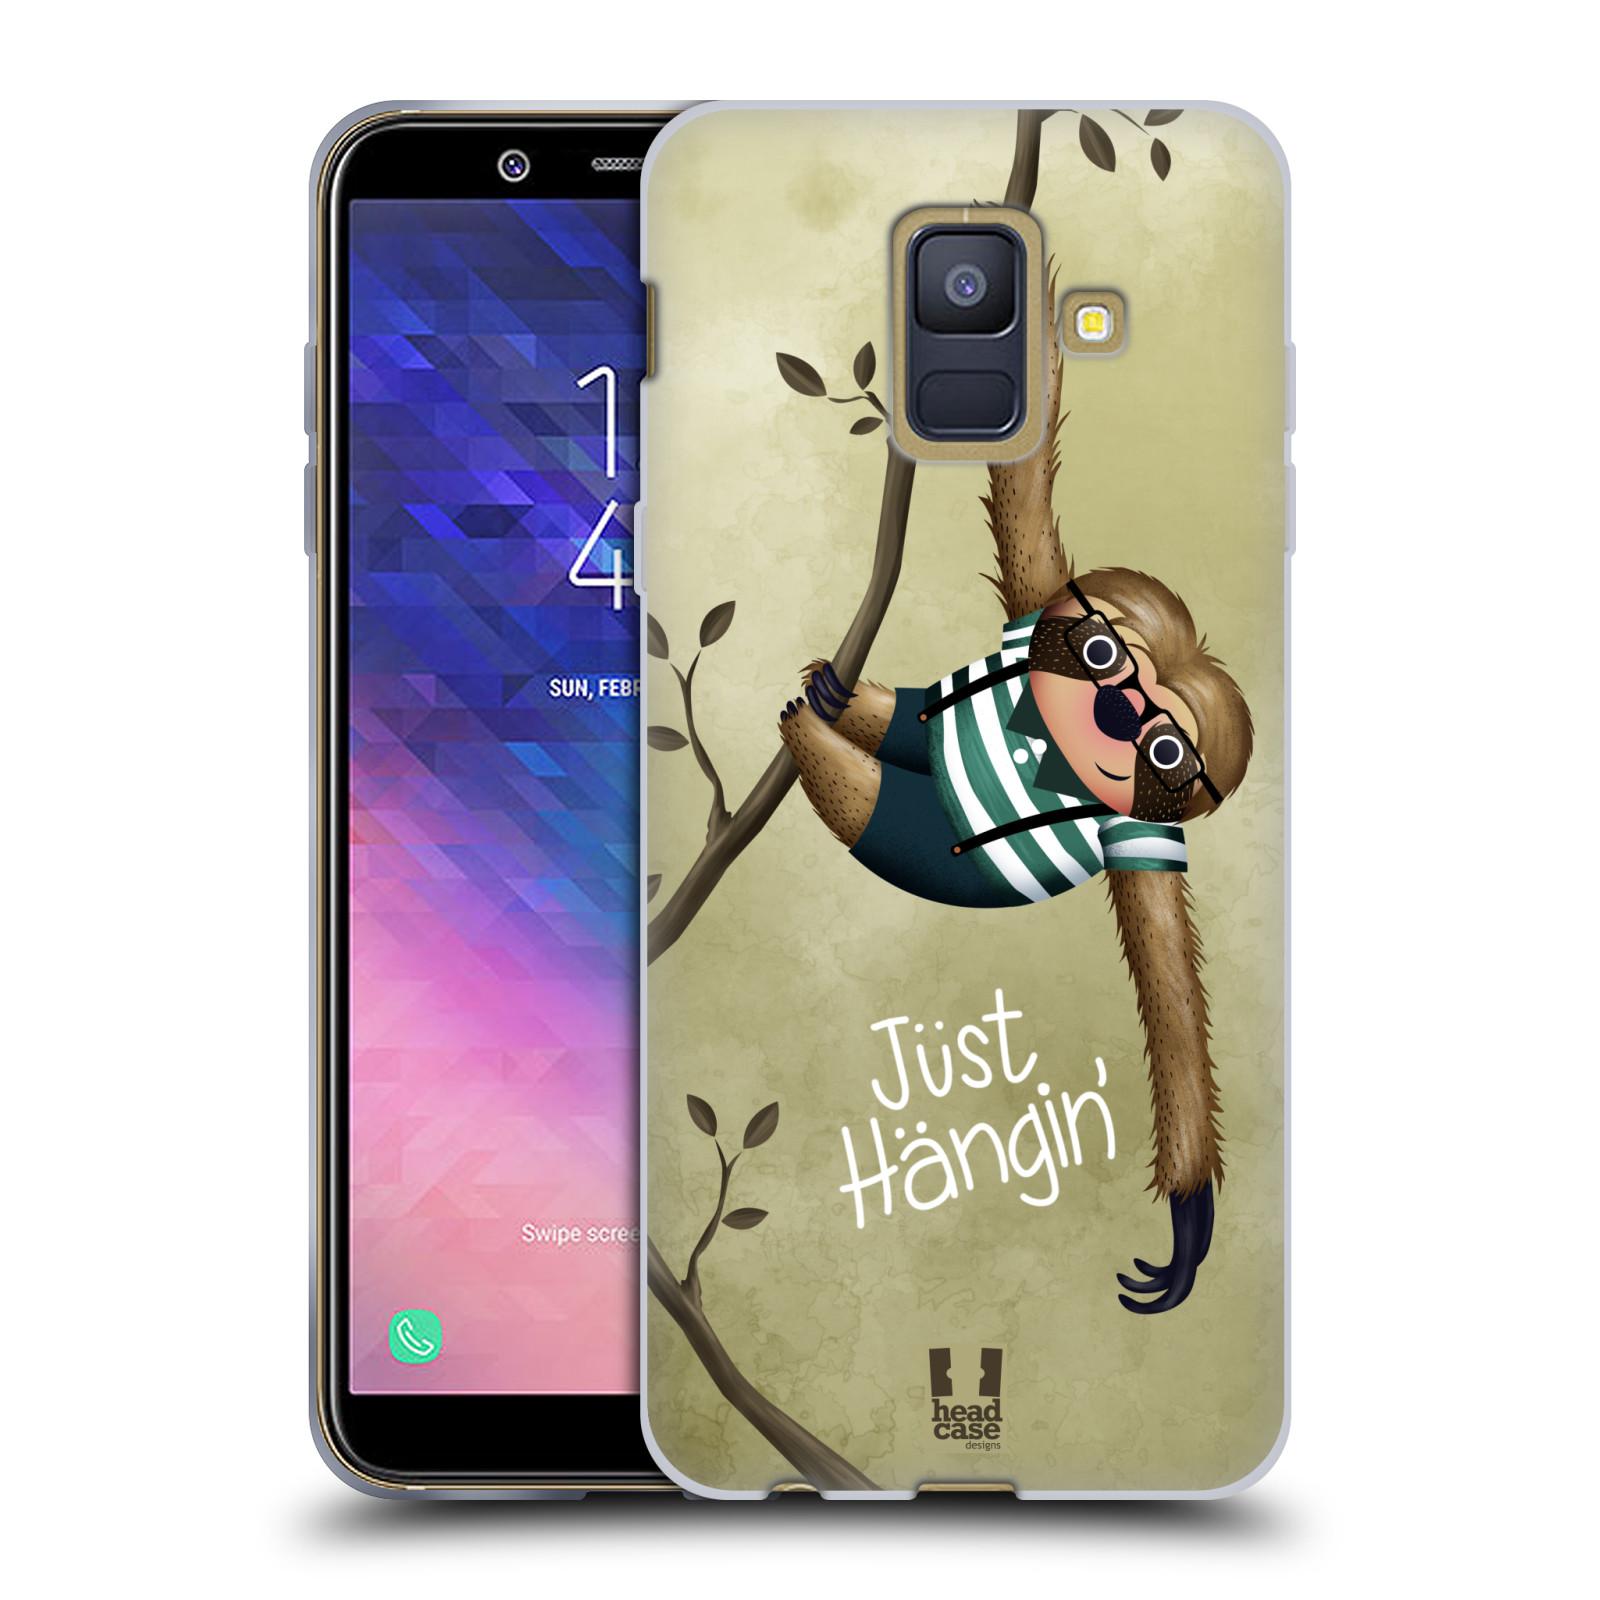 Silikonové pouzdro na mobil Samsung Galaxy A6 (2018) - Head Case - Lenochod Just Hangin